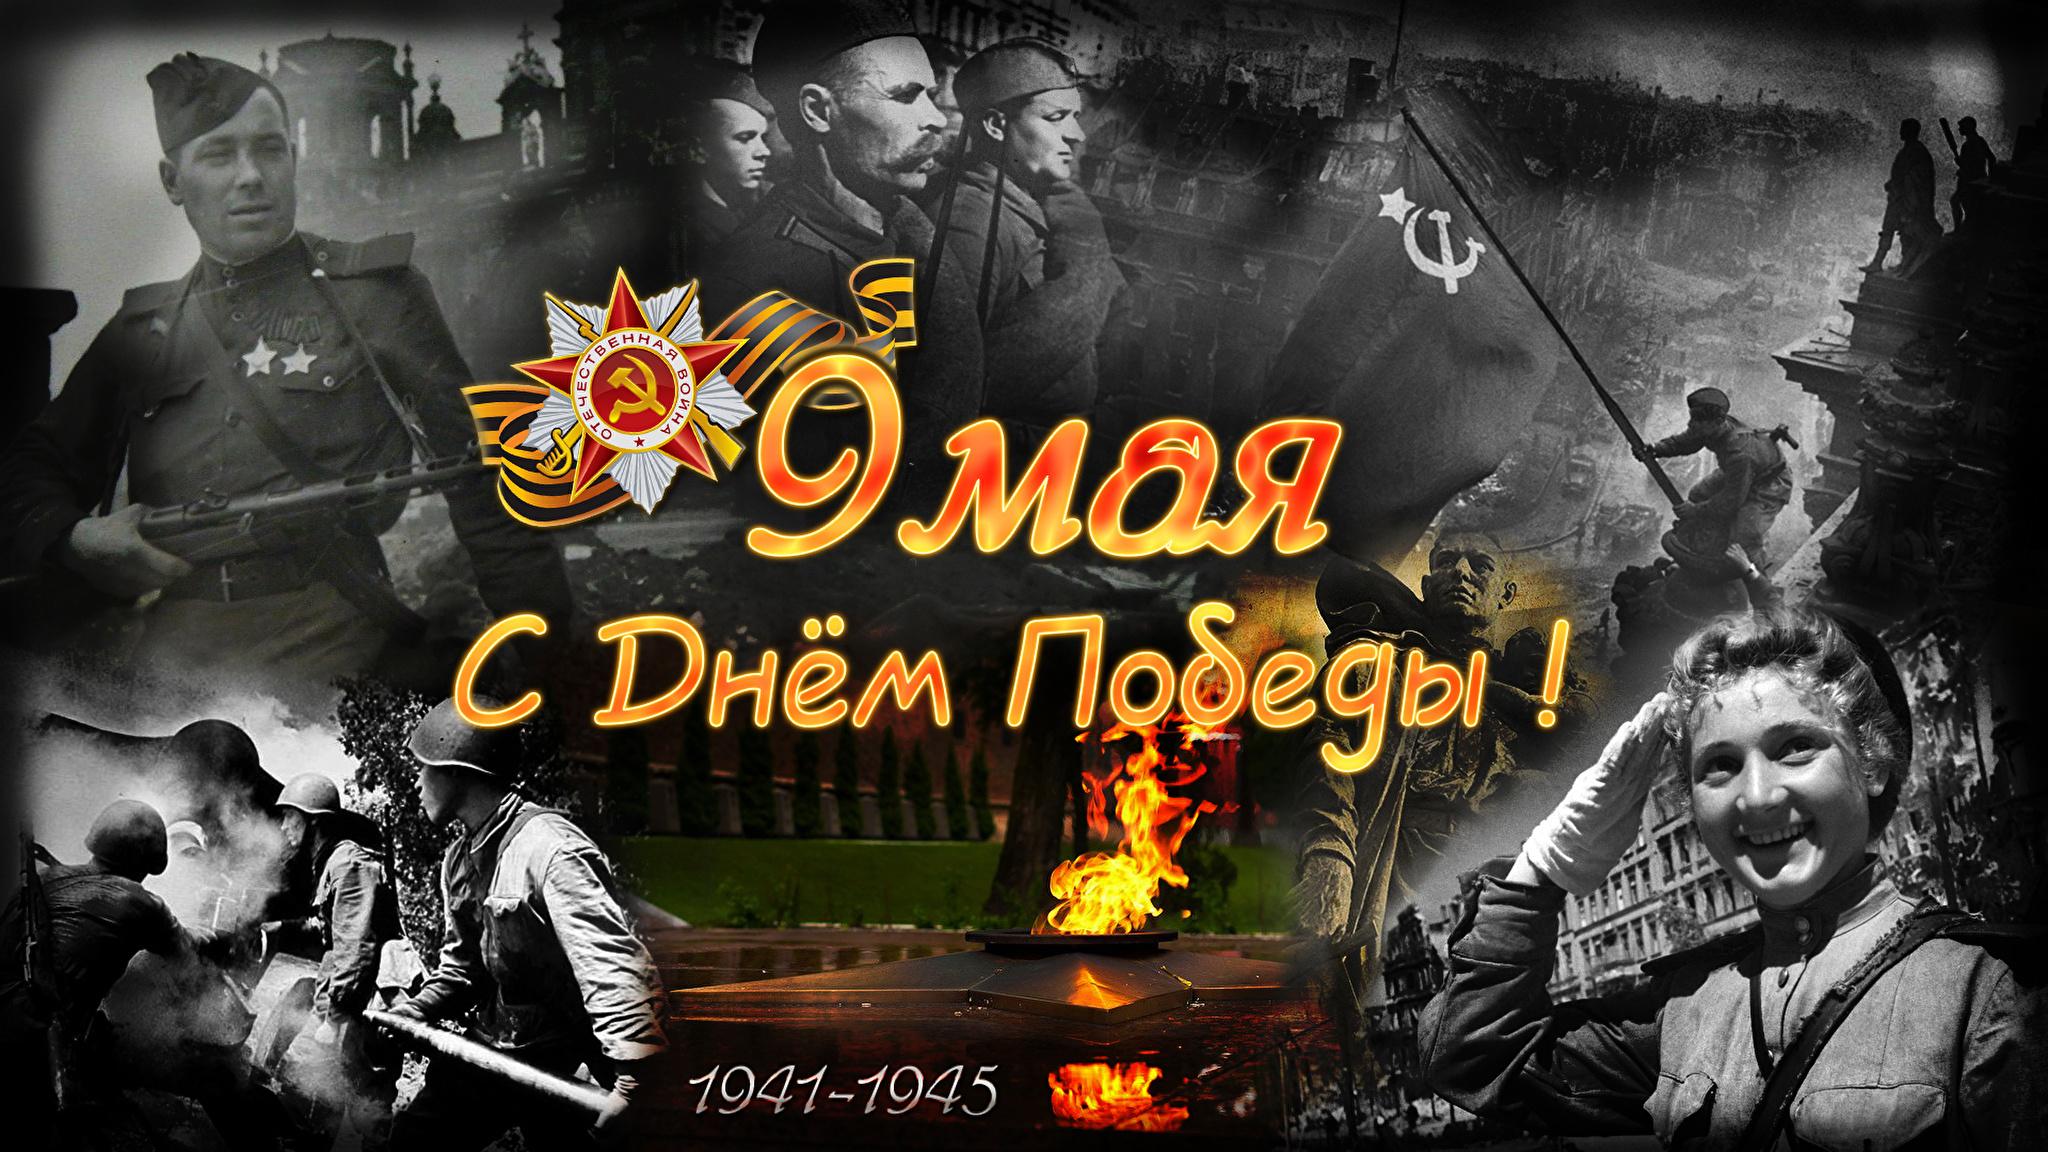 Holidays_Victory_Day_9_May_Russian_521637_2048x1152.jpg